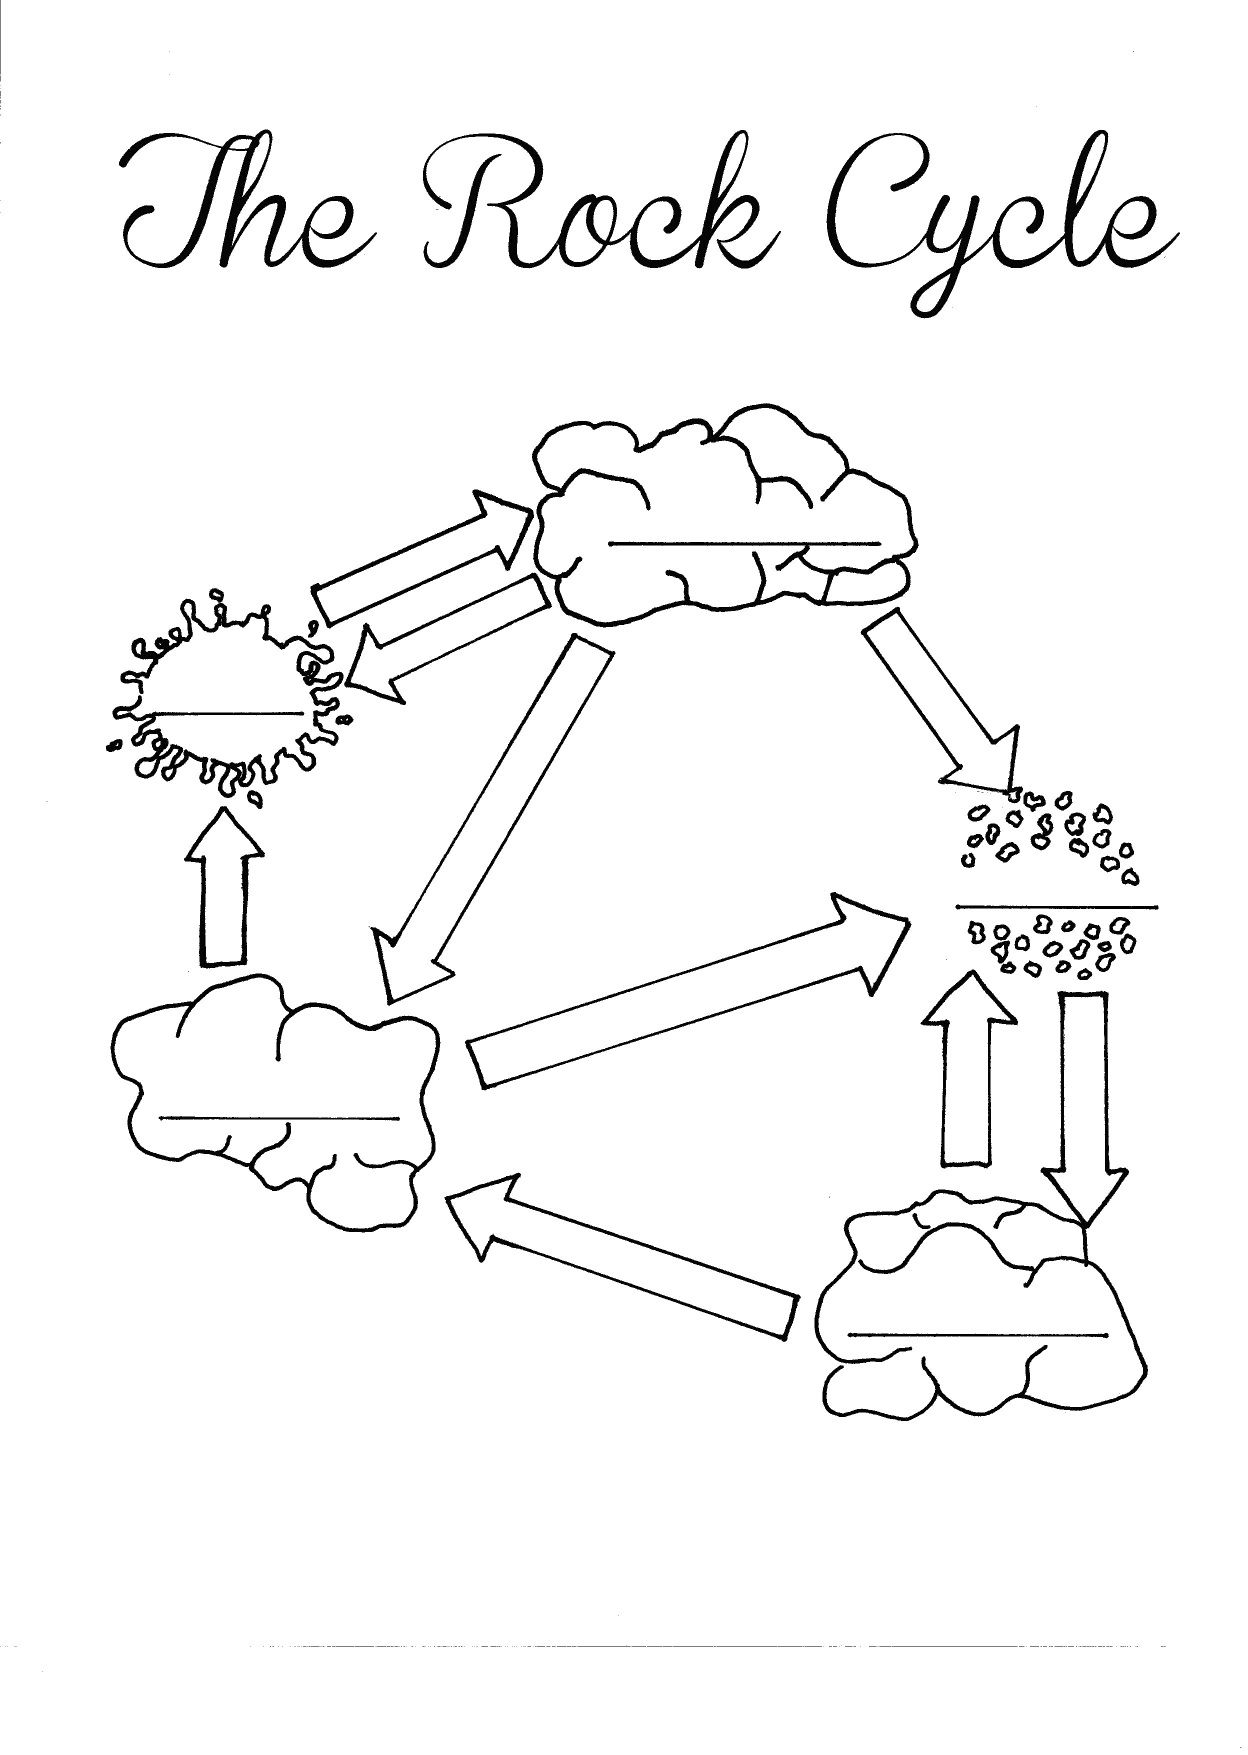 third grade rock cycle fill in diagram